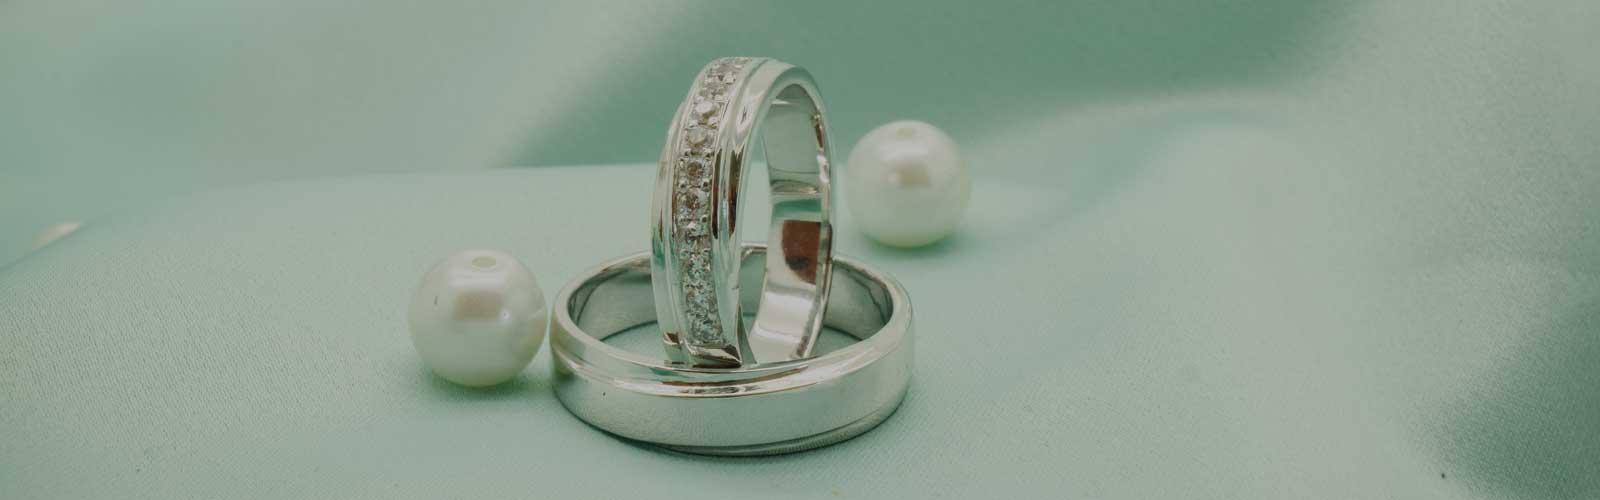 Keunggulan zavira jewelry